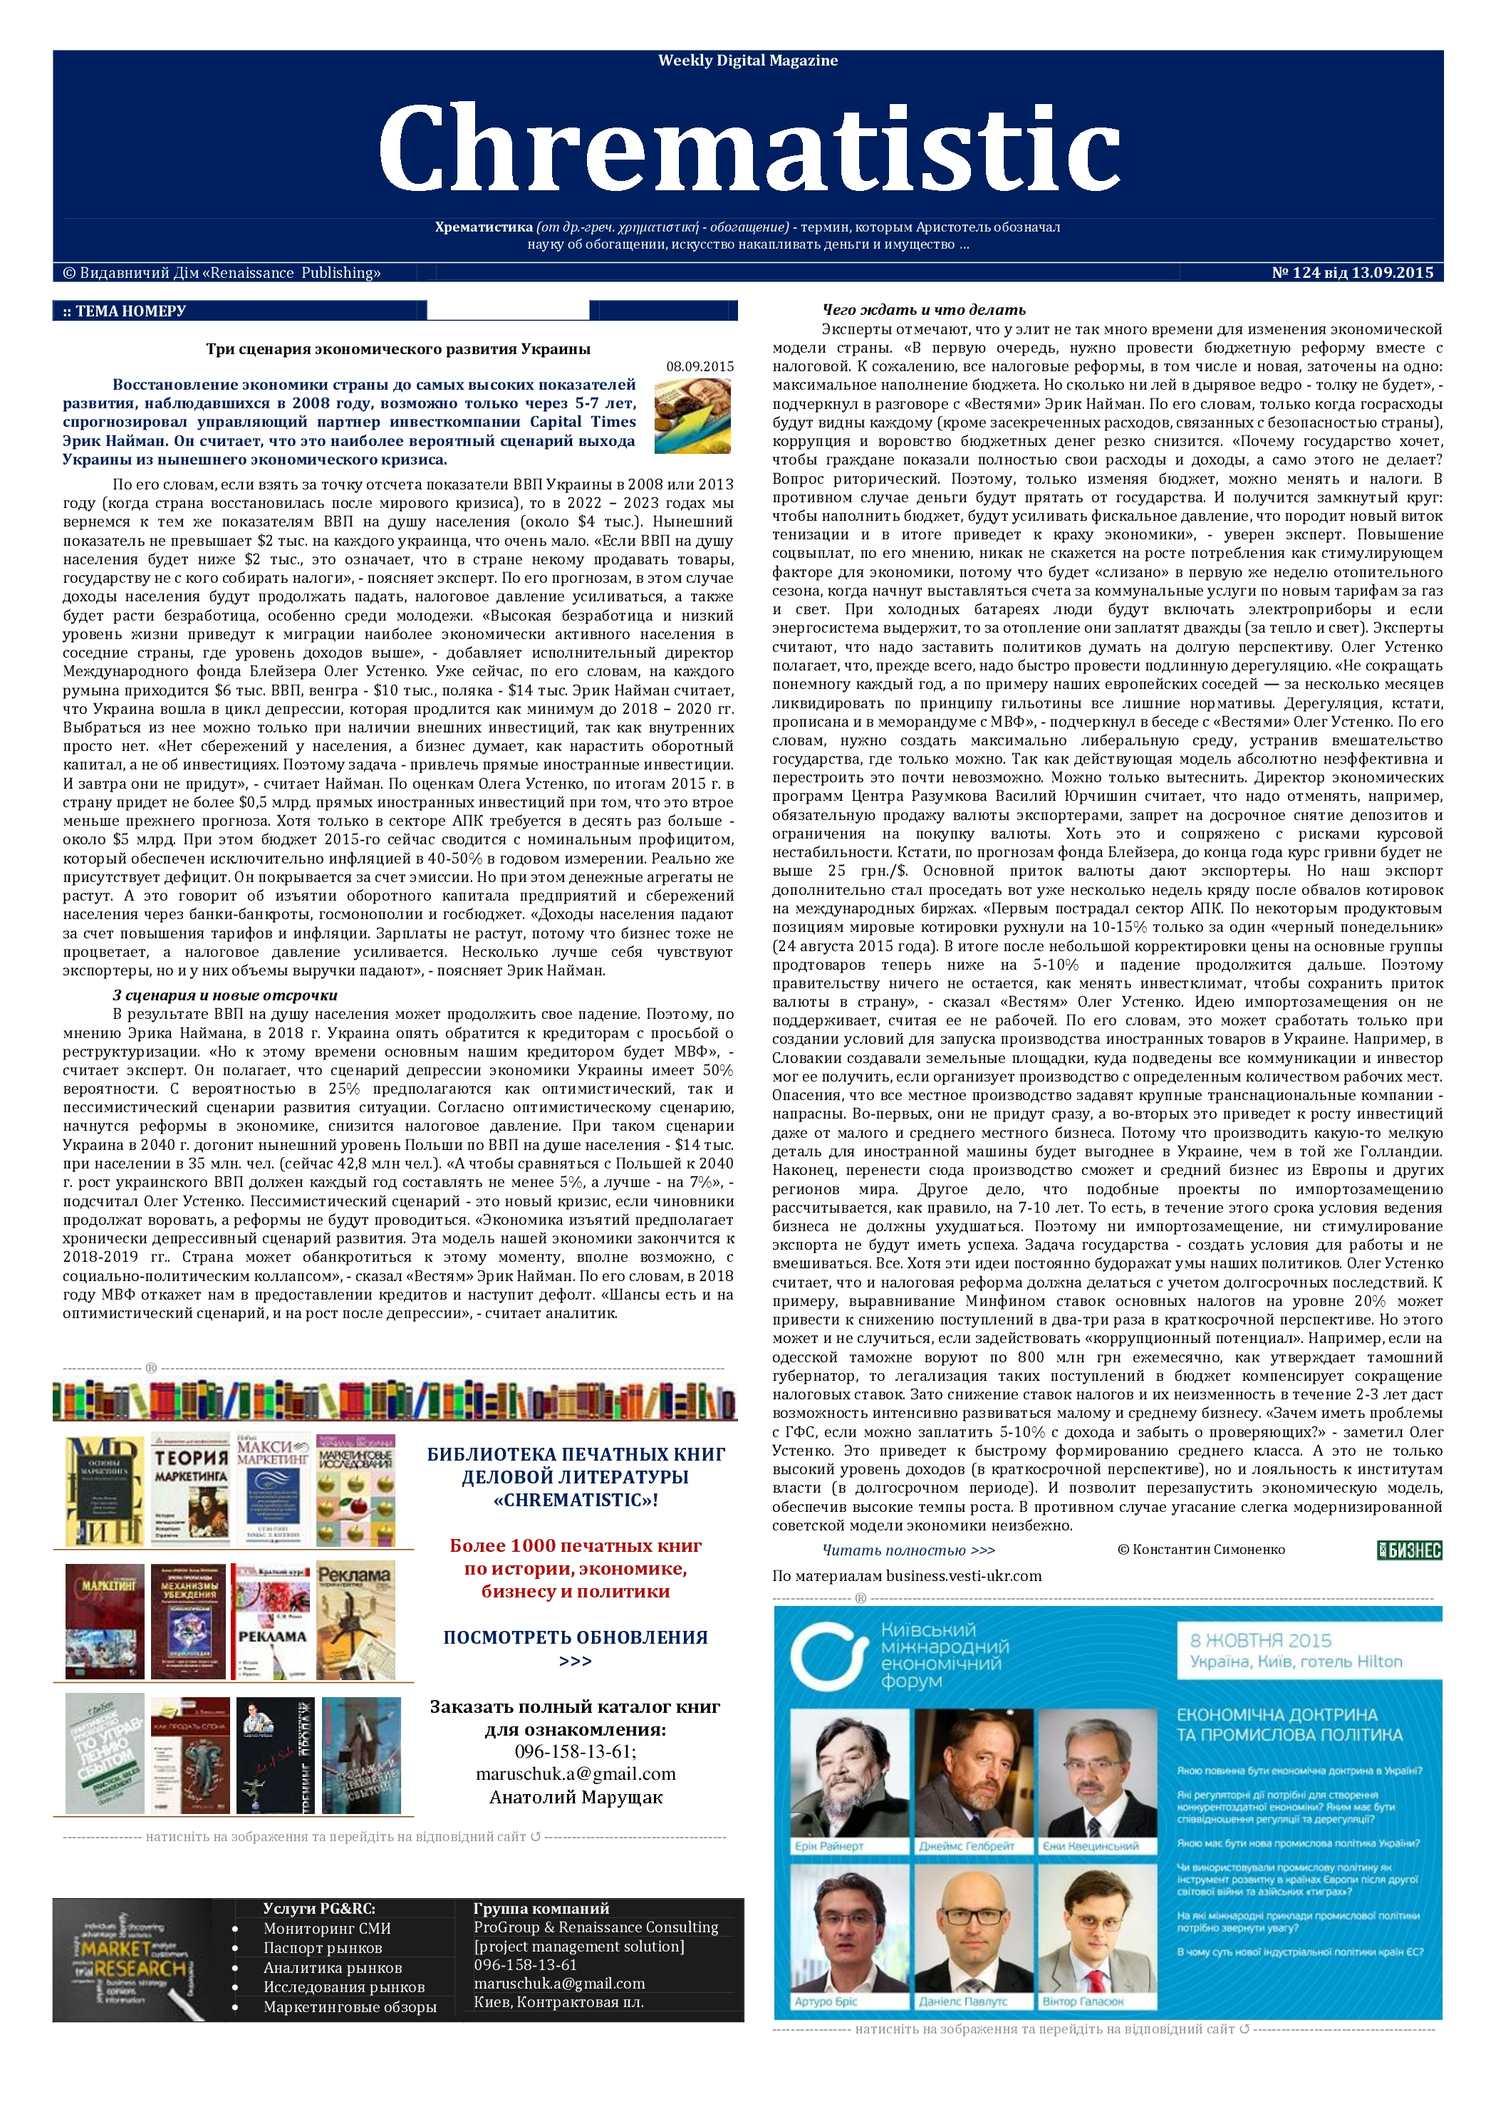 Salon Jardin Promo Best Of Calaméo №124 Wdm Chrematistic от 13 09 2015 Of 34 Inspirant Salon Jardin Promo